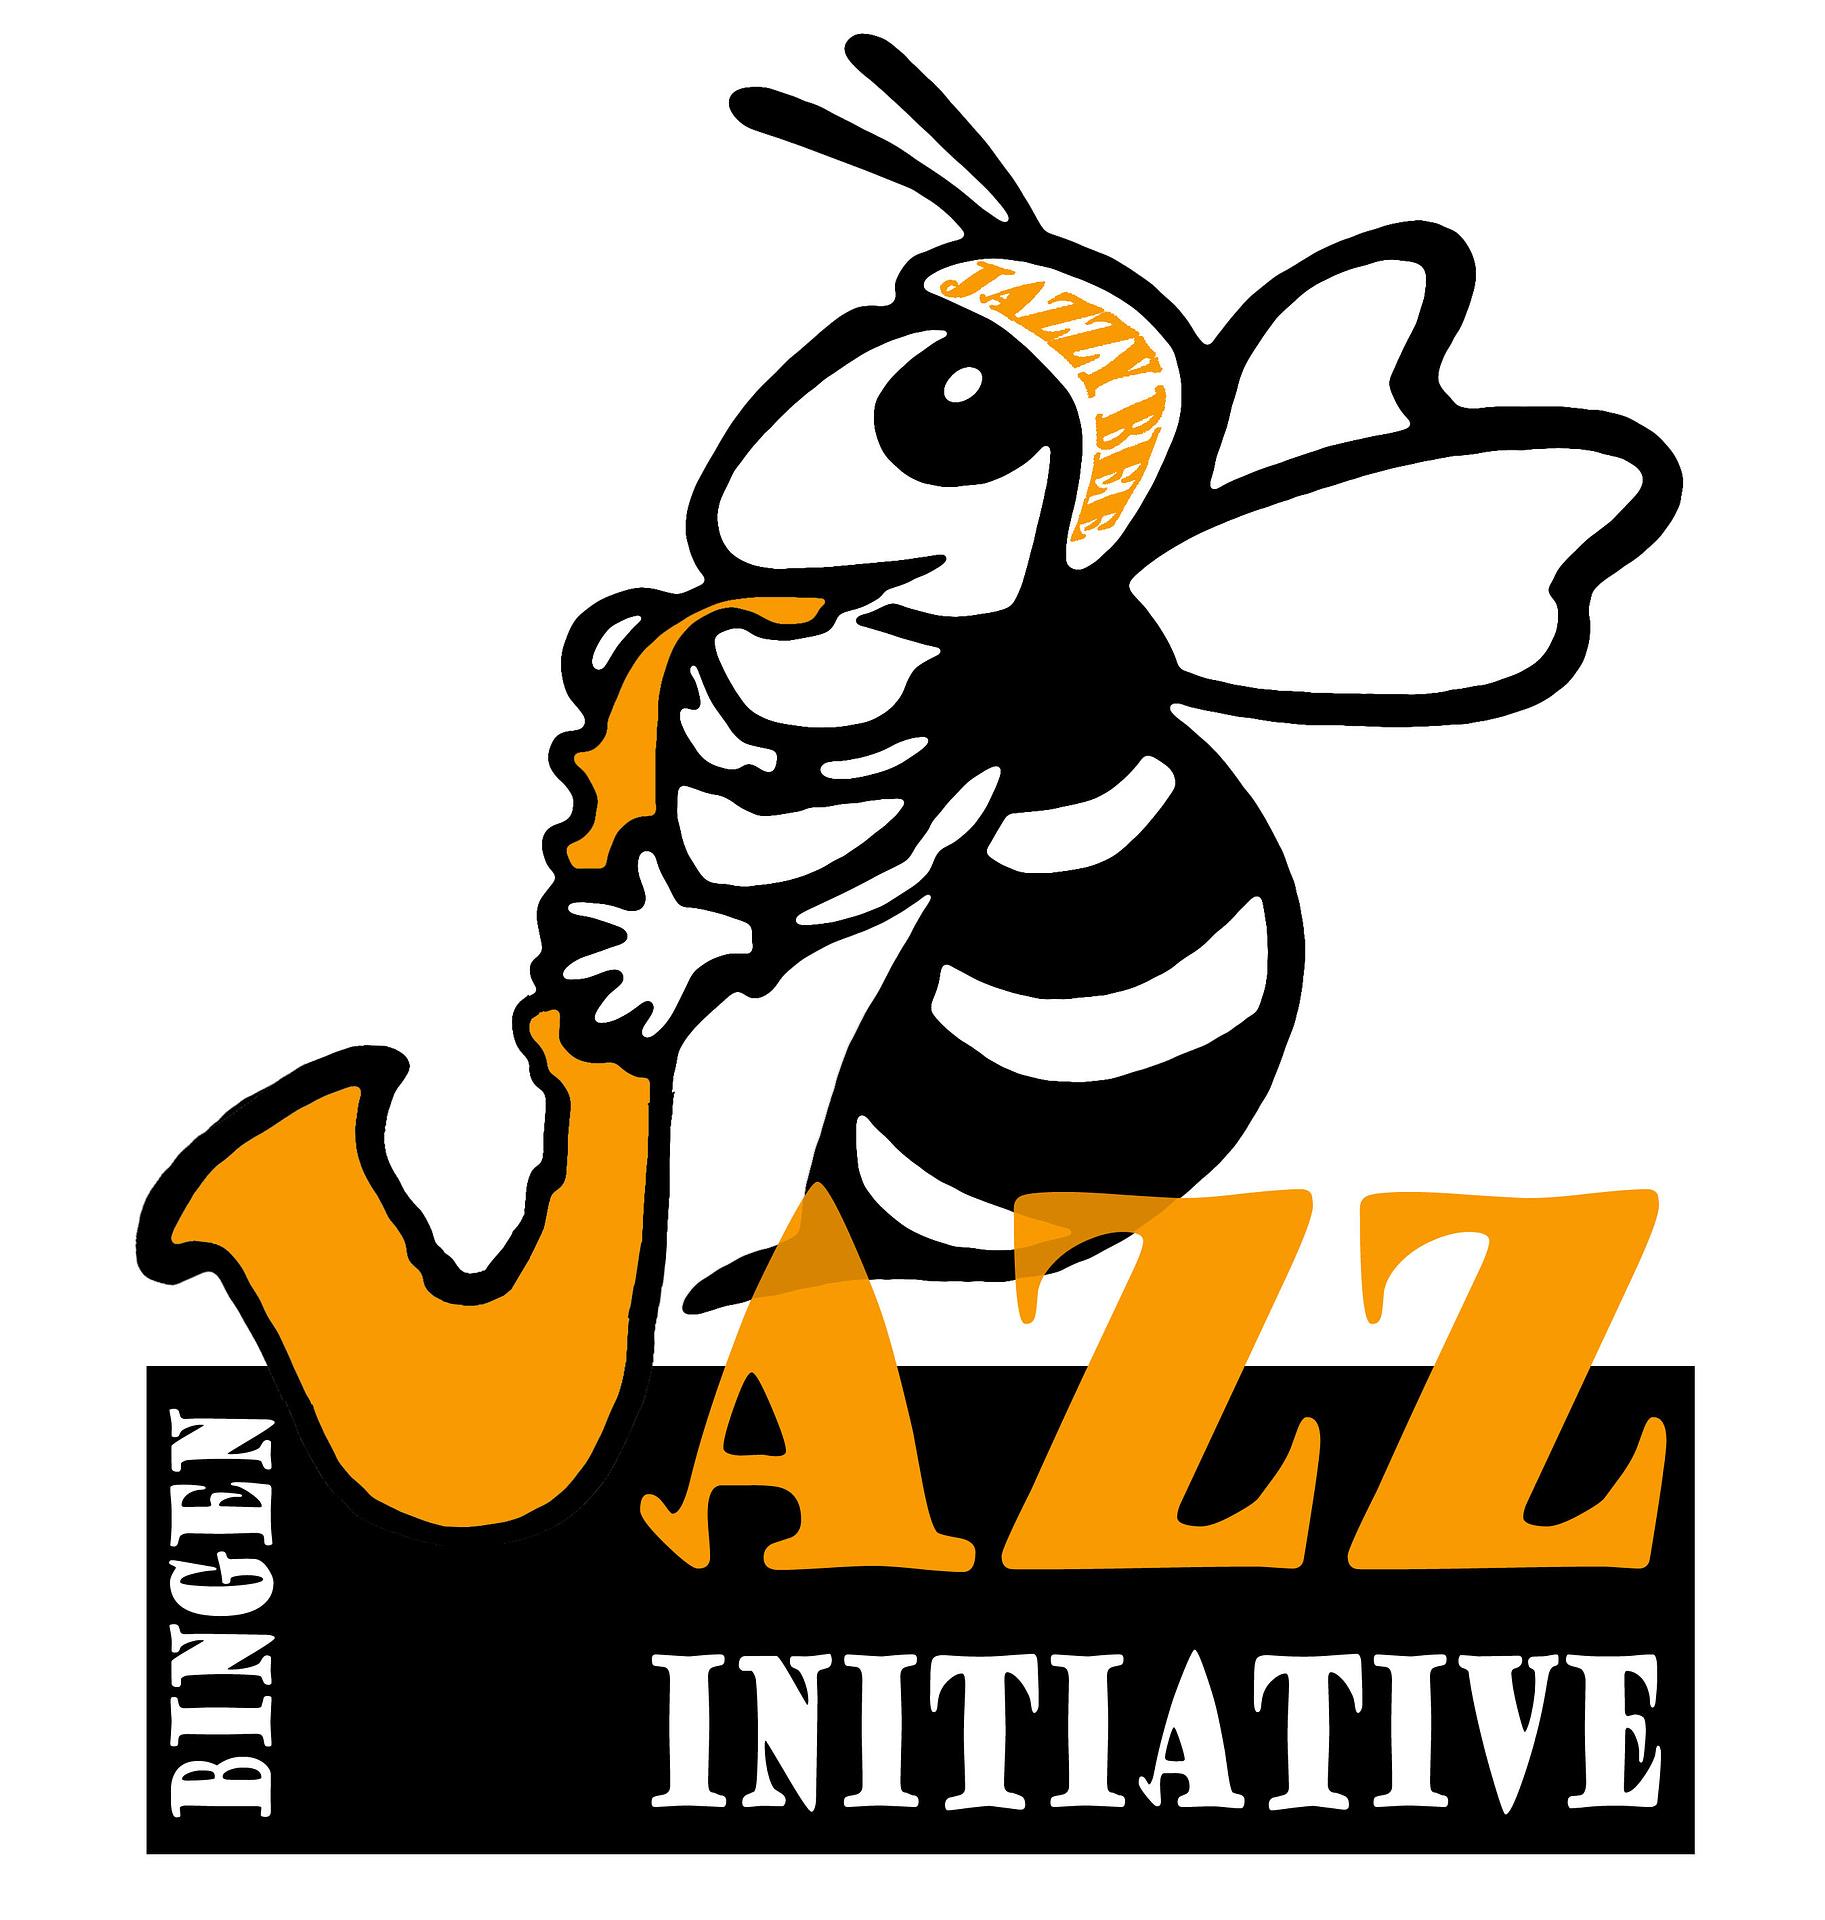 Jazzinitiative Bingen e.V.